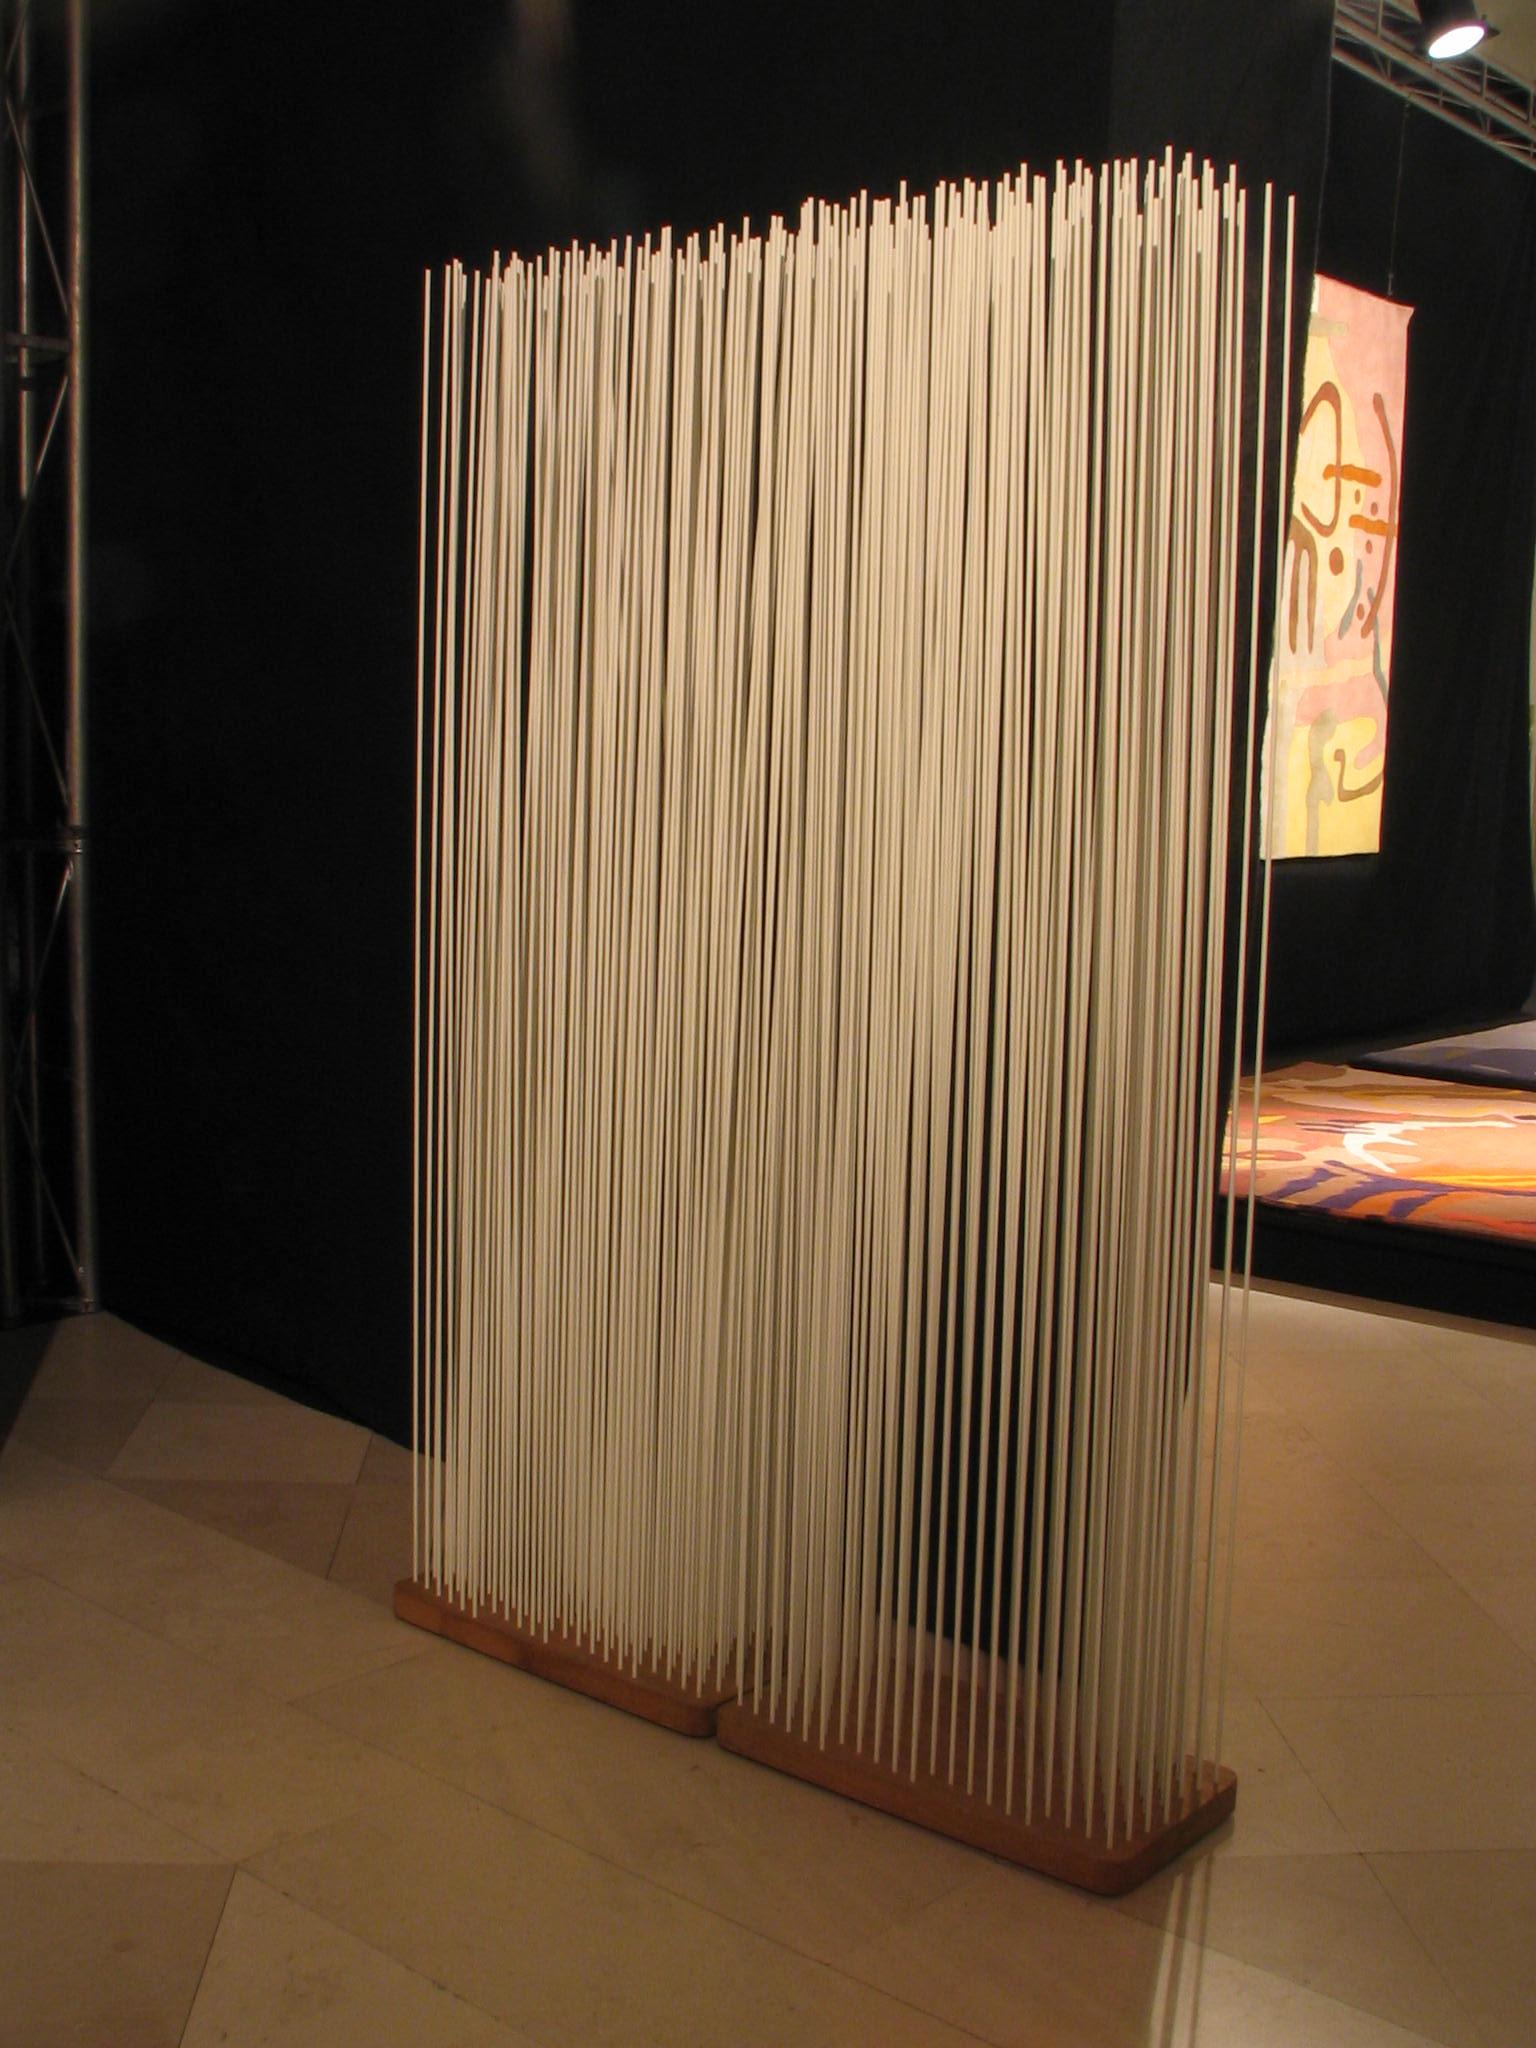 Room divider from fiber glass bars